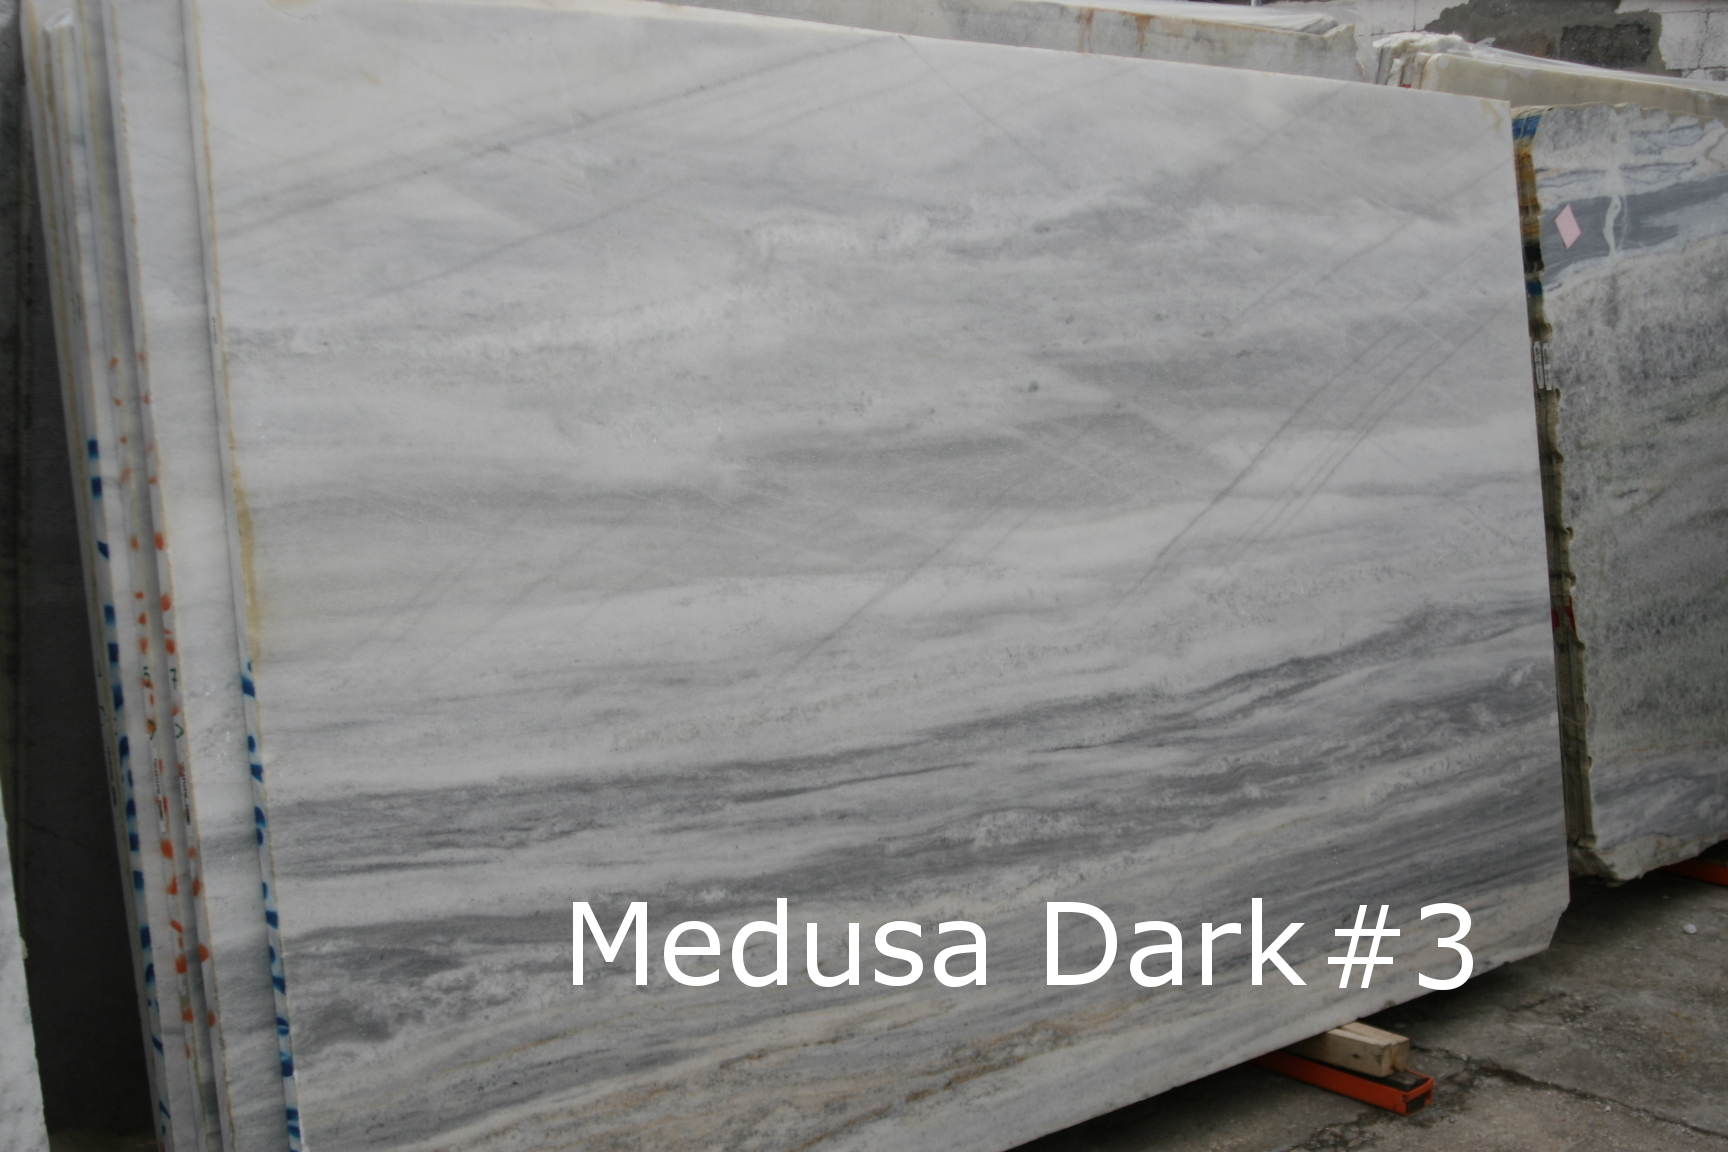 Medusa Dark #3